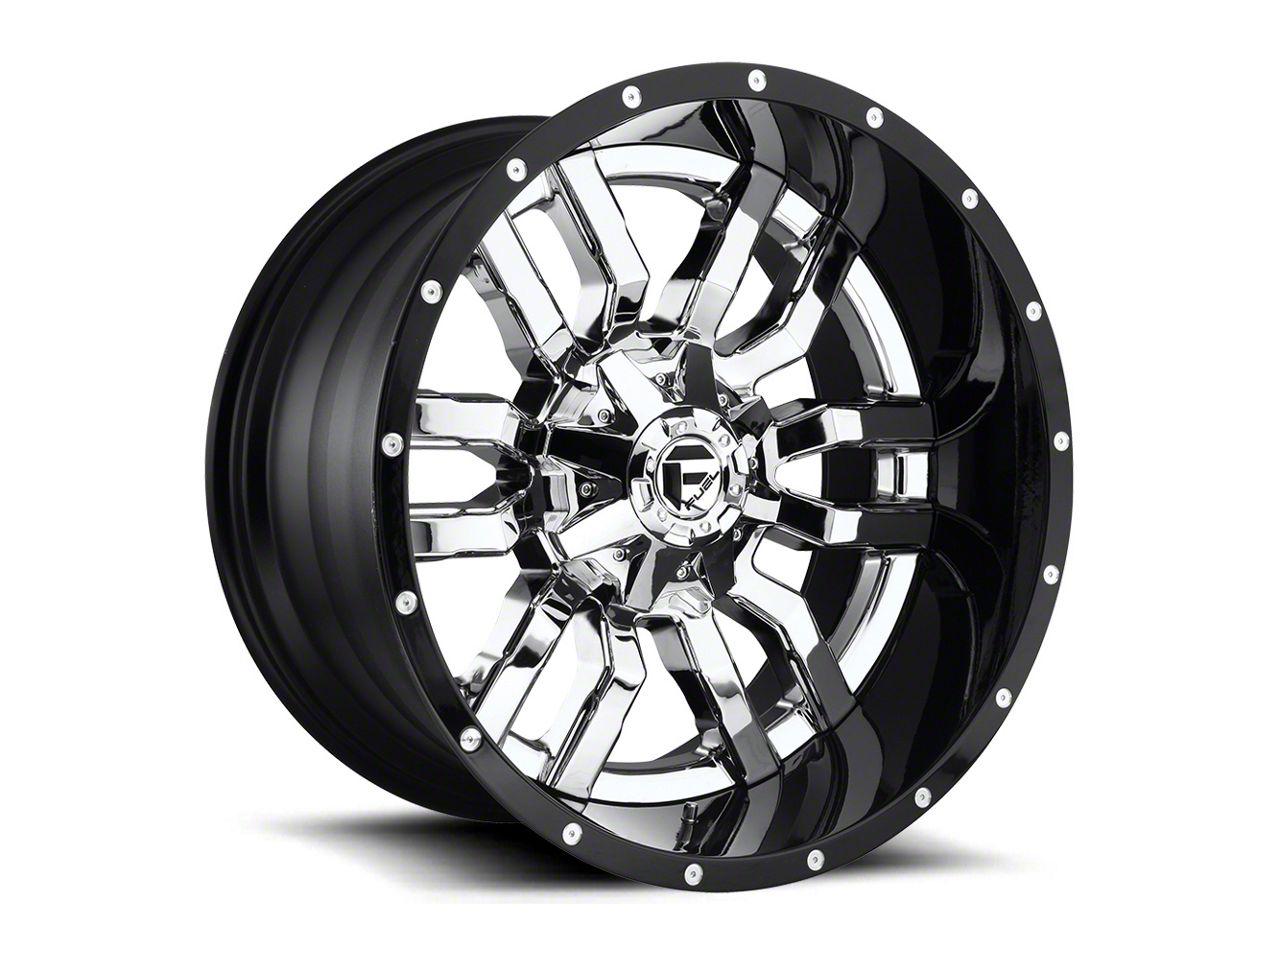 Fuel Wheels Sledge Chrome 6-Lug Wheel - 22x10 (04-18 F-150)